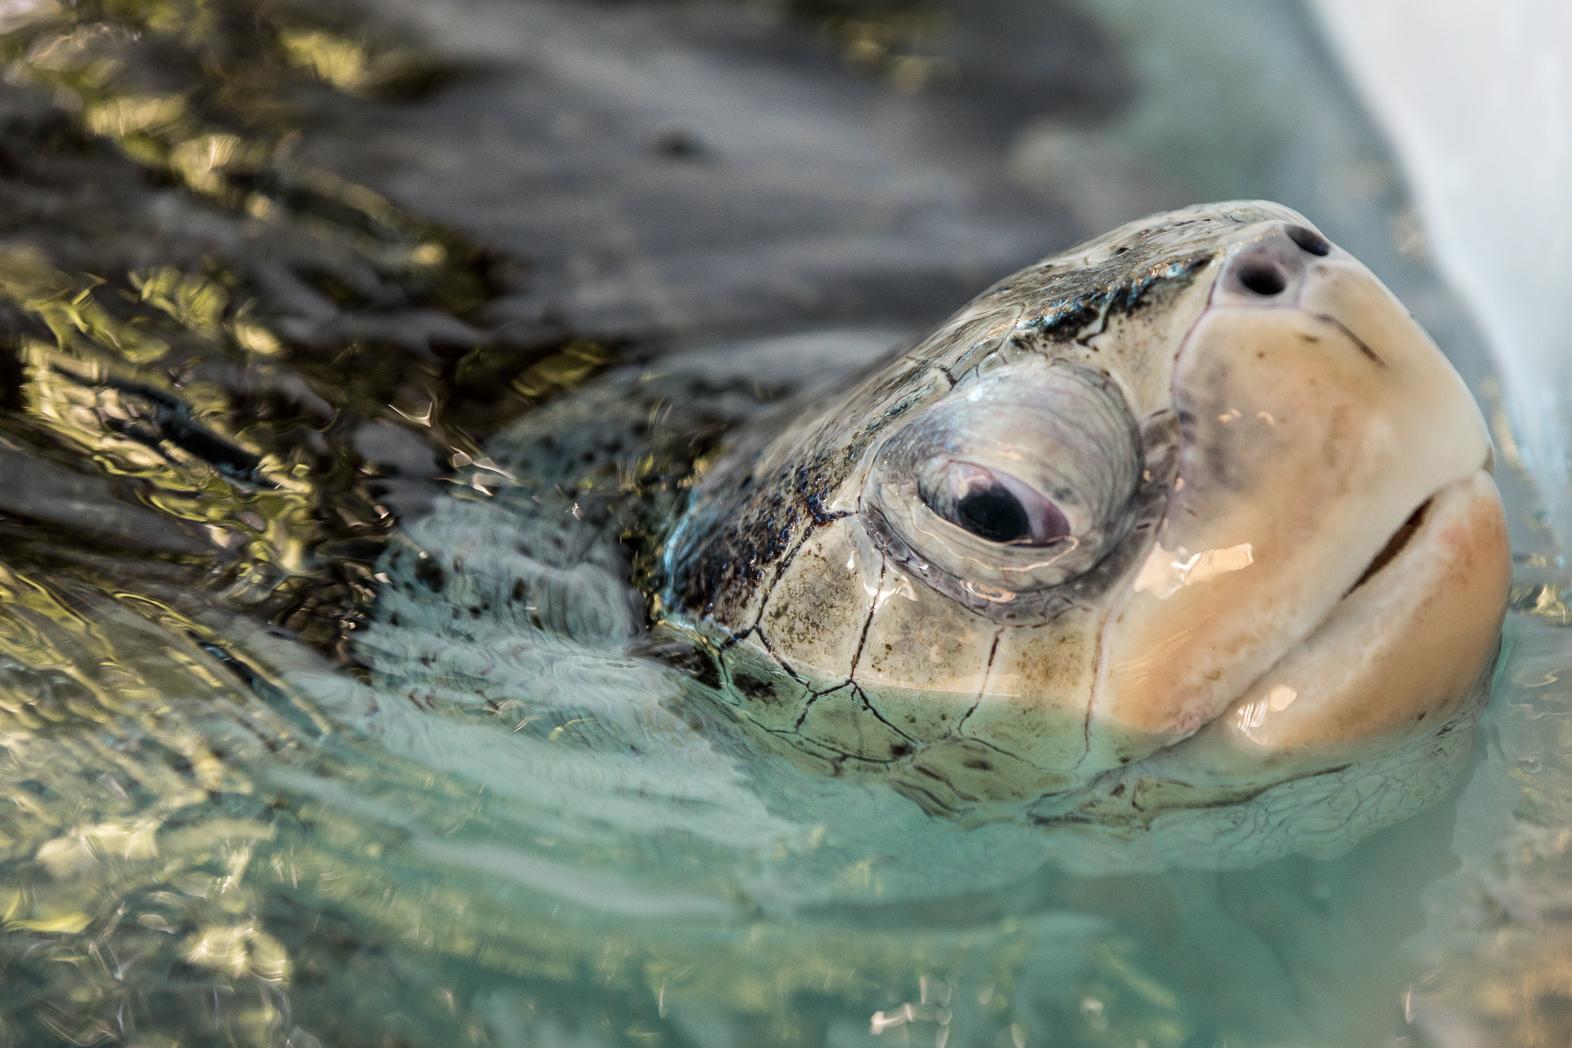 Cairns_Turtle_Rehab_Centre-LMP-11.jpg